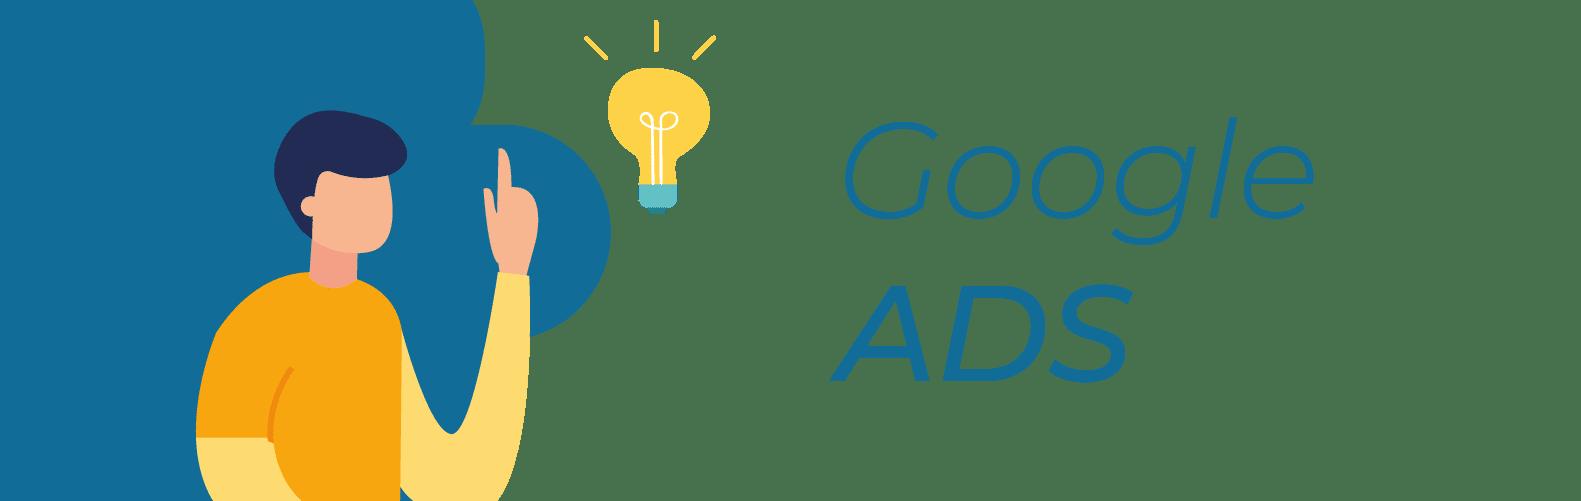 Da Sapere - Google ADS